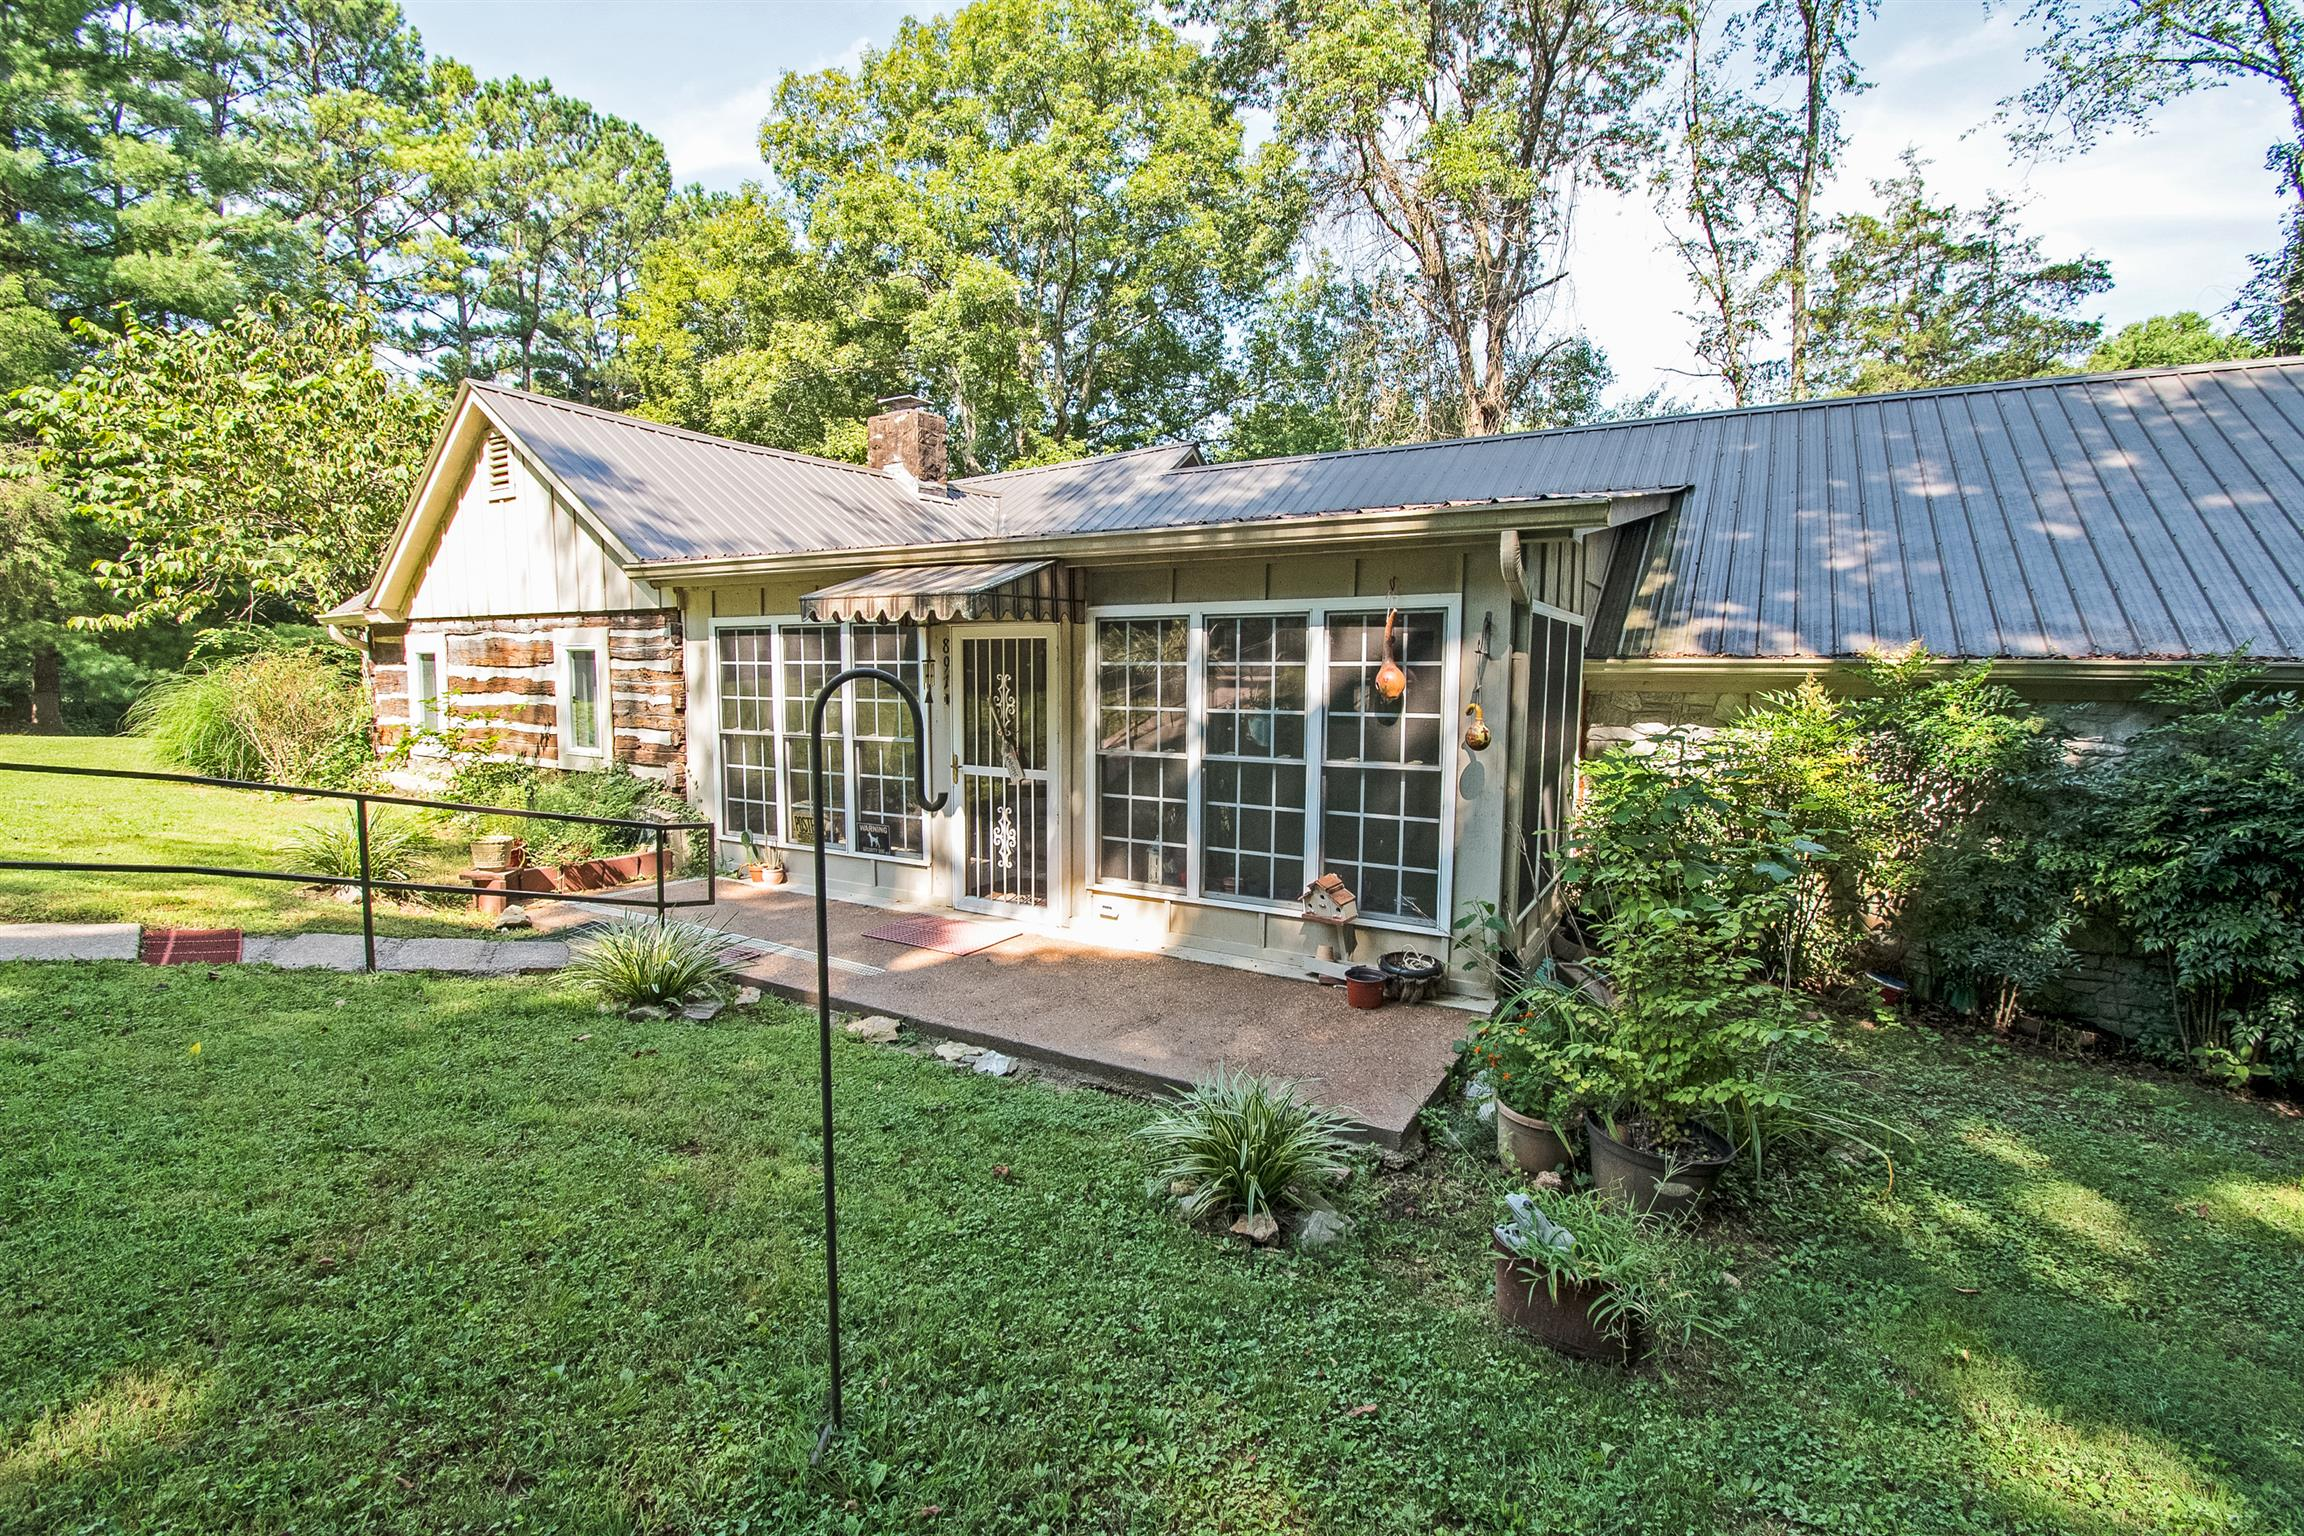 891 Dirt Rd, Clarksville, TN 37040 - Clarksville, TN real estate listing